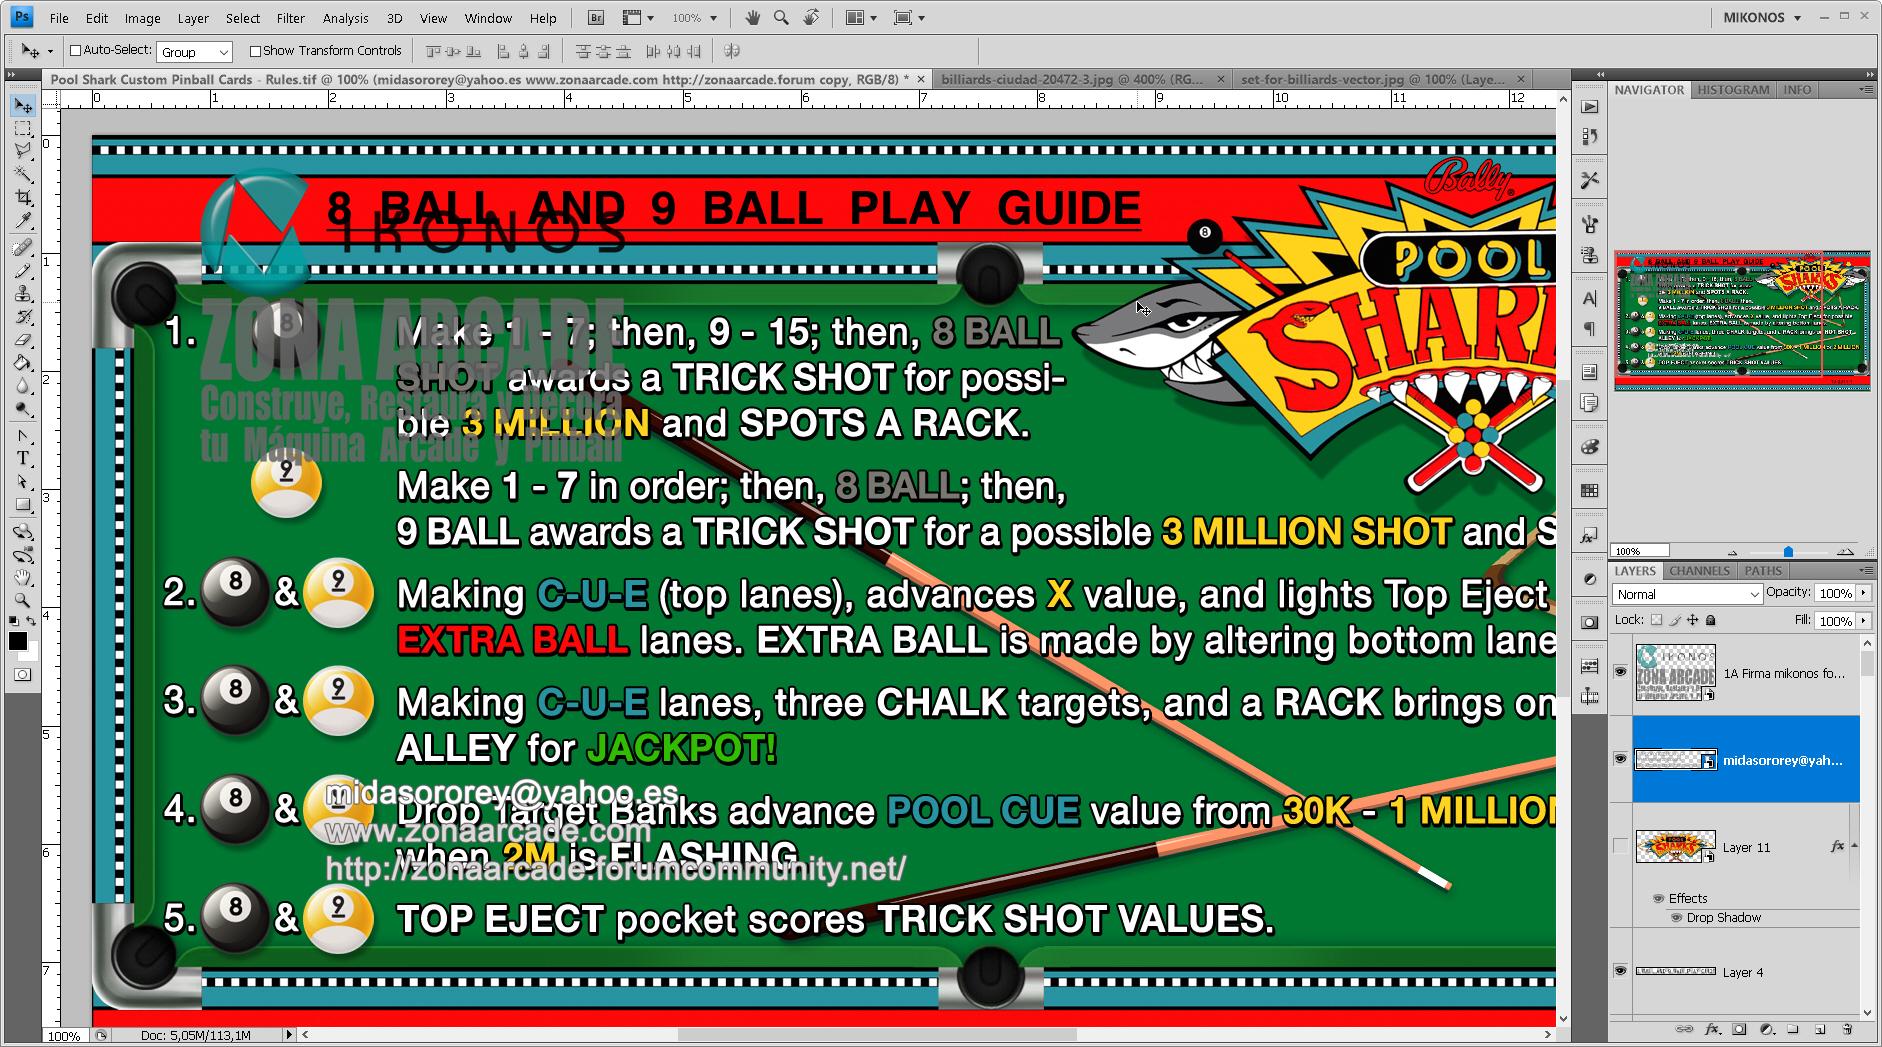 Pool%20Shark%20Pinball%20Card%20Customized%20-%20Rules.%20Mikonos2.jpg